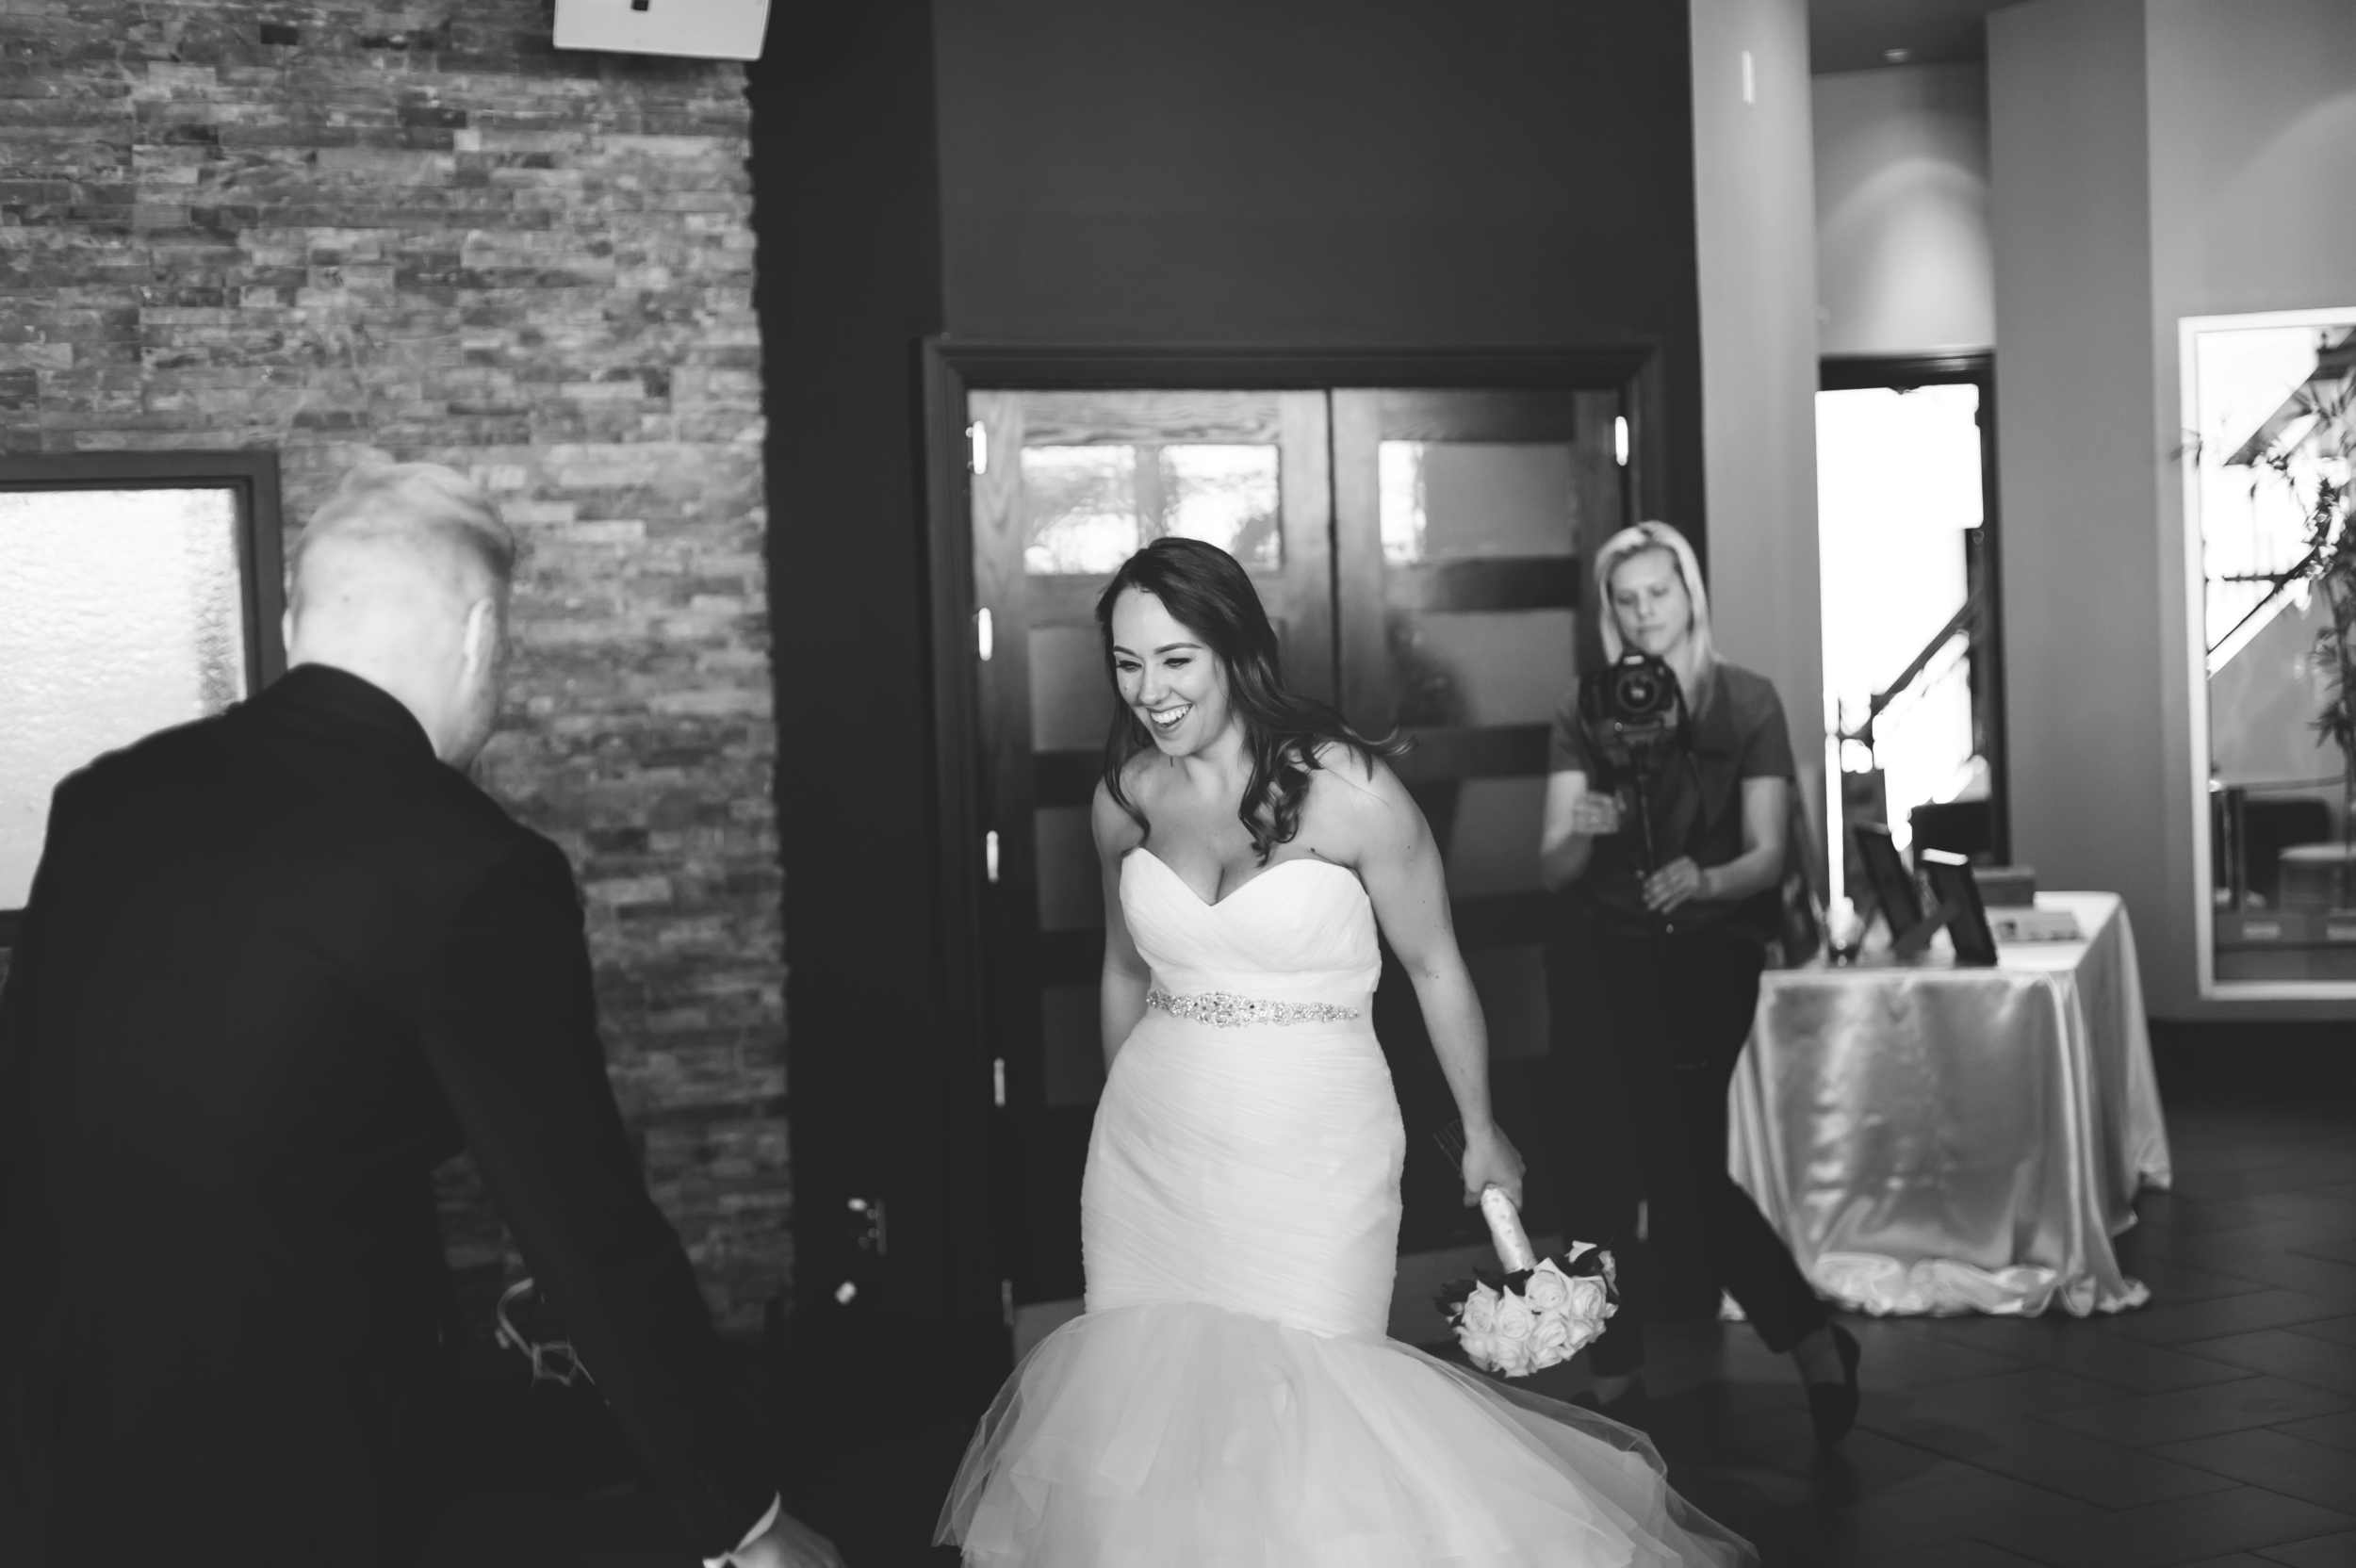 Wedding-Harbour-Banquet-Center-Oakville-Photographer-Wedding-Hamilton-Saint-James-Espresso-Downtown-HamOnt-GTA-Niagara-Toronto-Moments-by-Lauren-Photography-Photo-Image-54.png